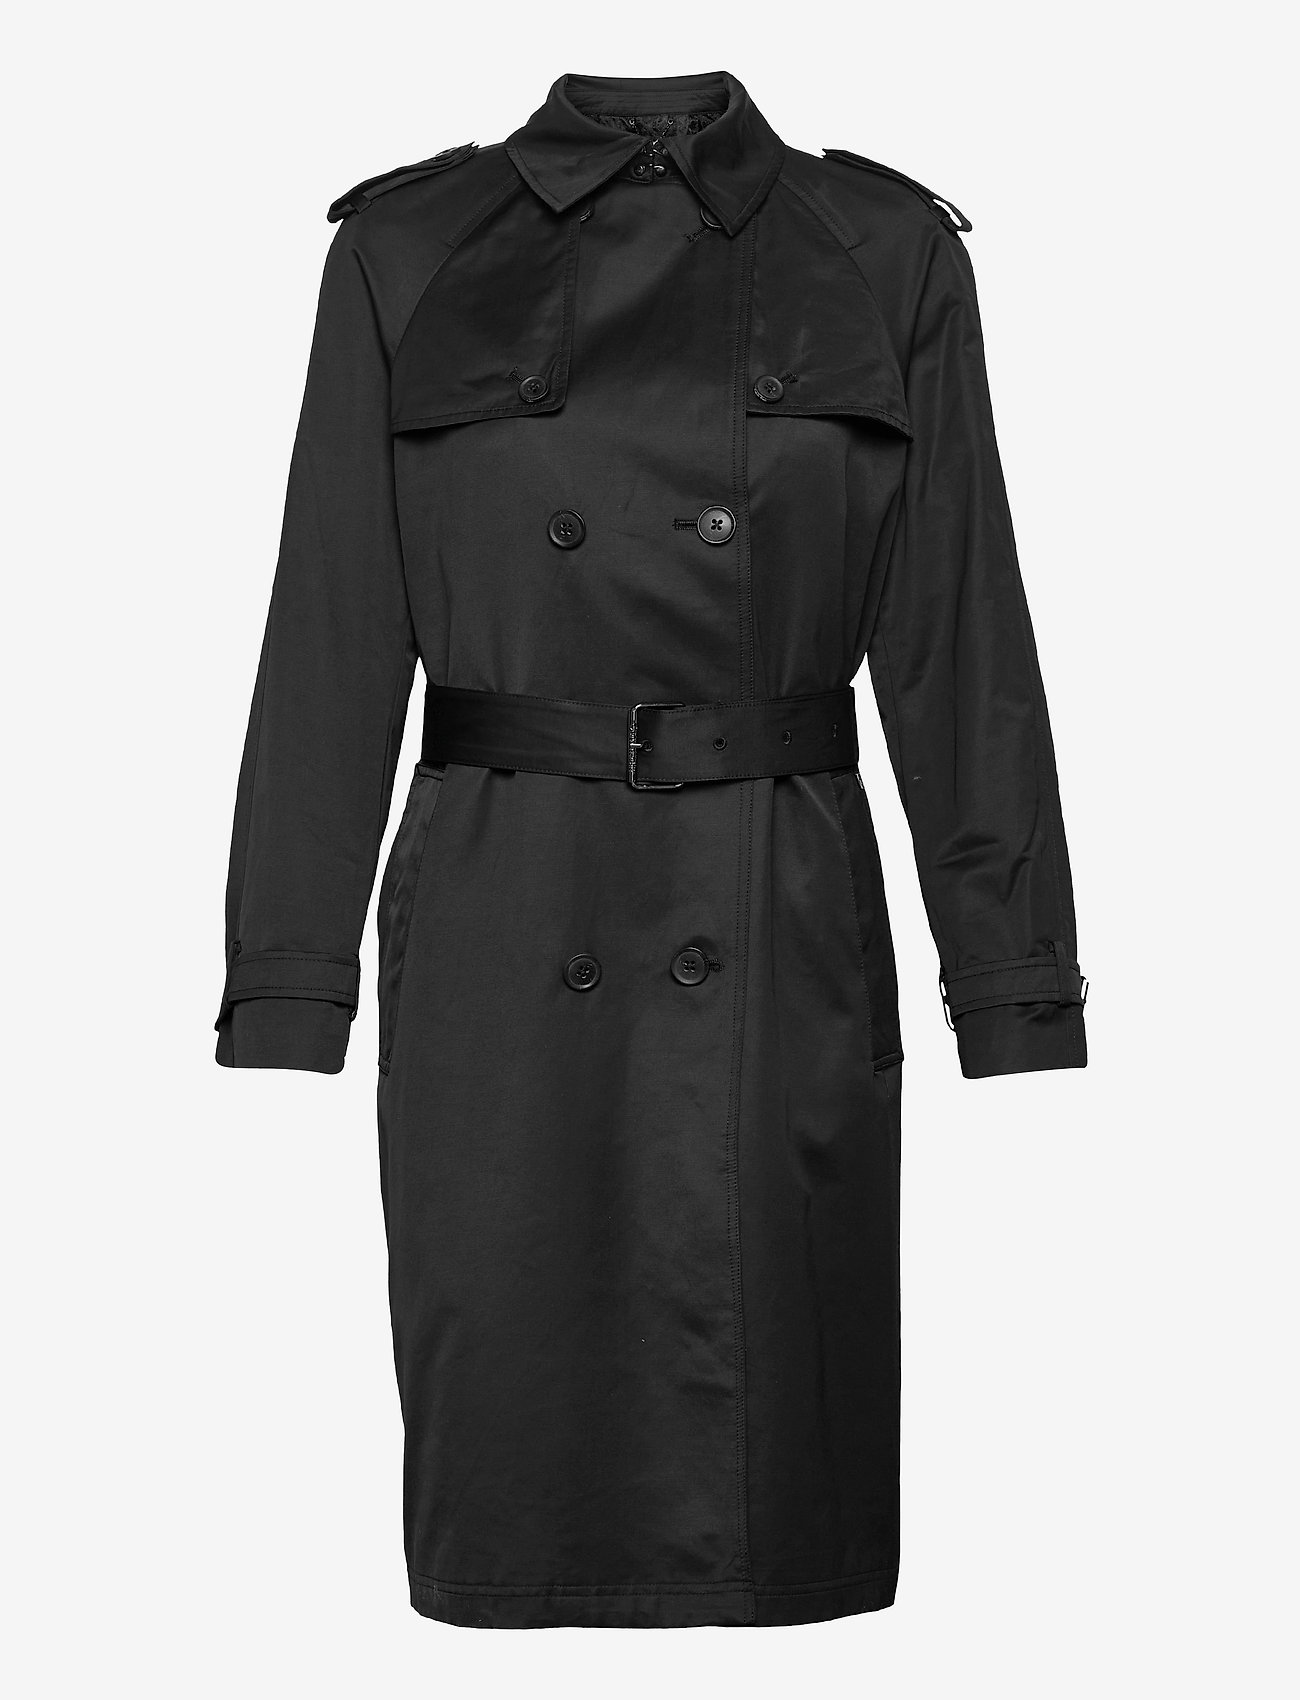 Calvin Klein - COTTON NYLON TRENCH COAT - trenchcoats - ck black - 0